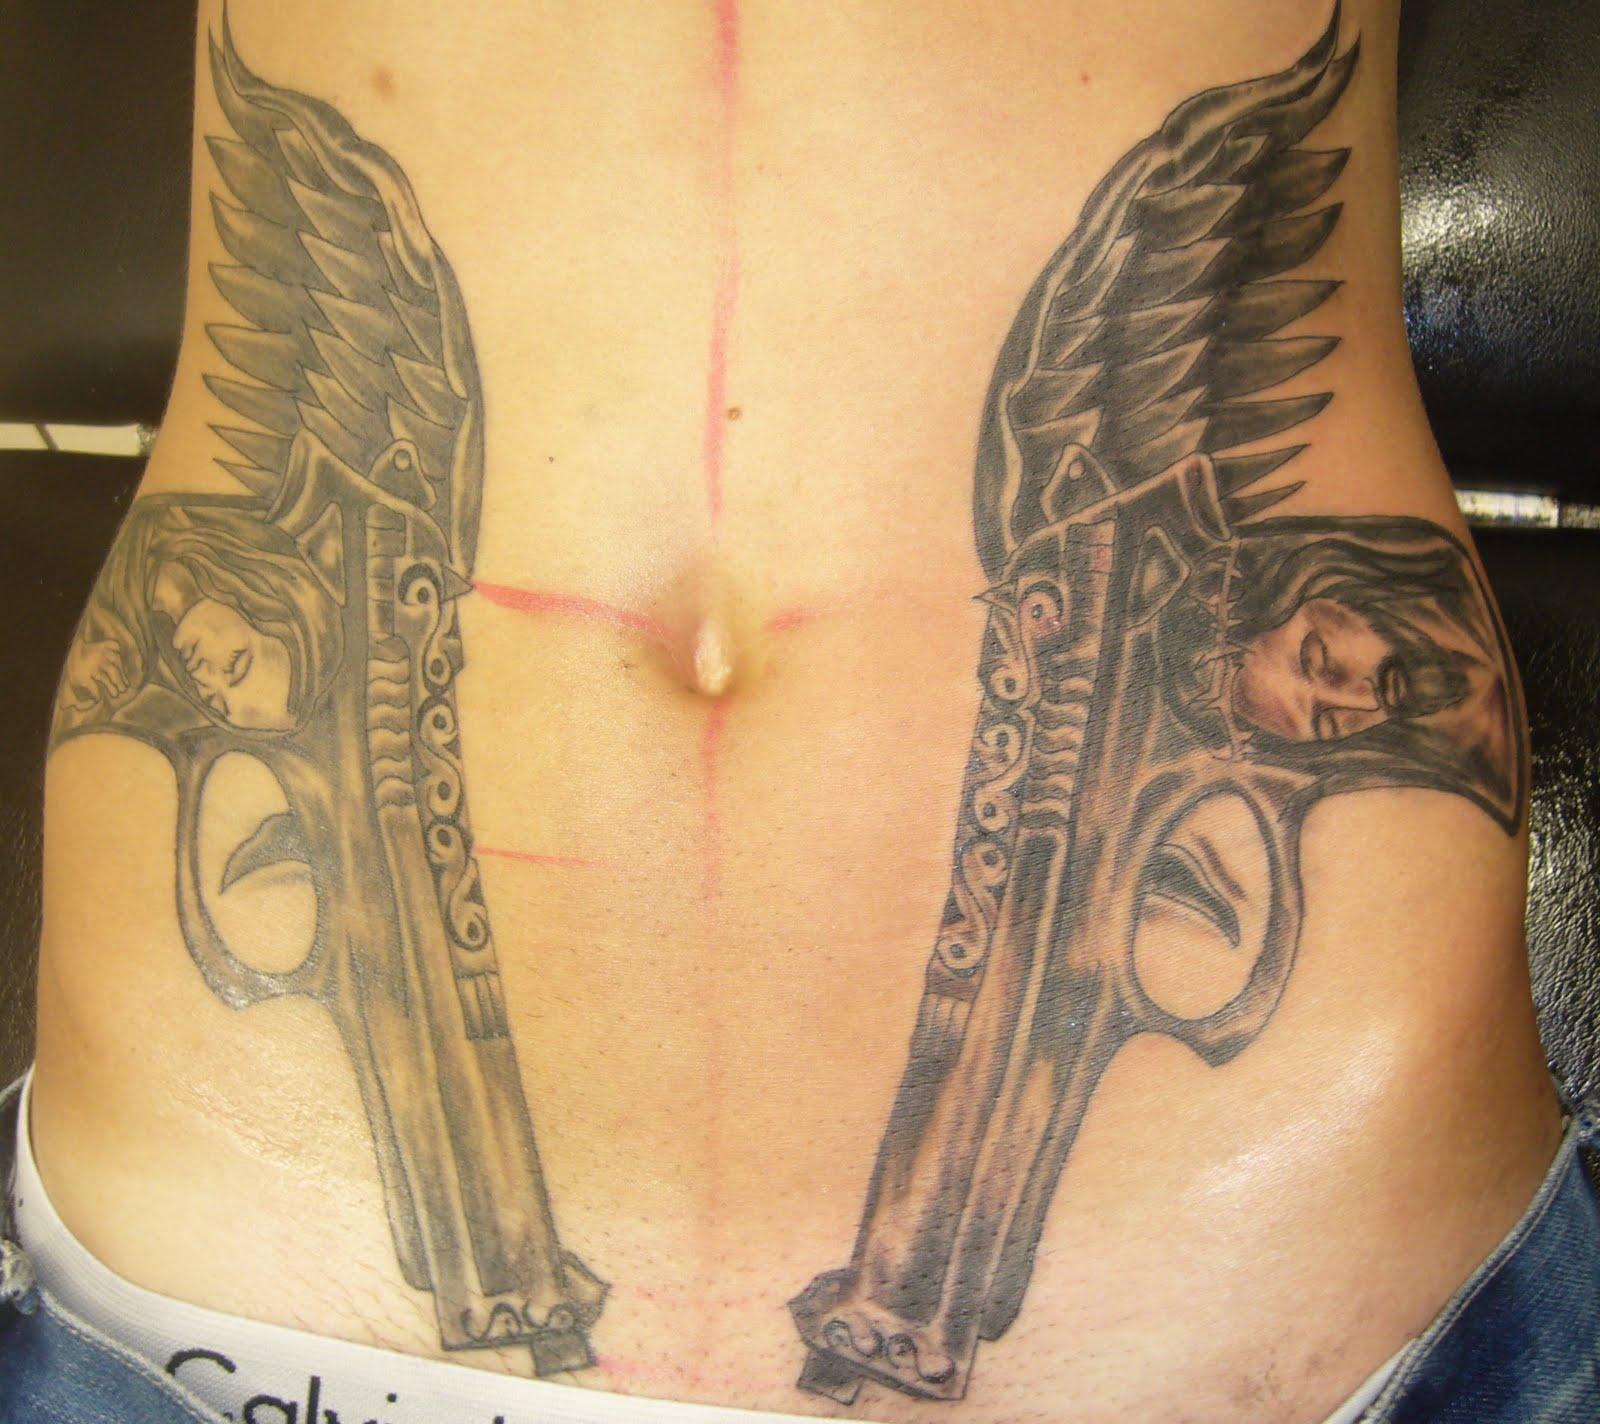 8e20140fc 45 Amazing Gun Tattoo Designs